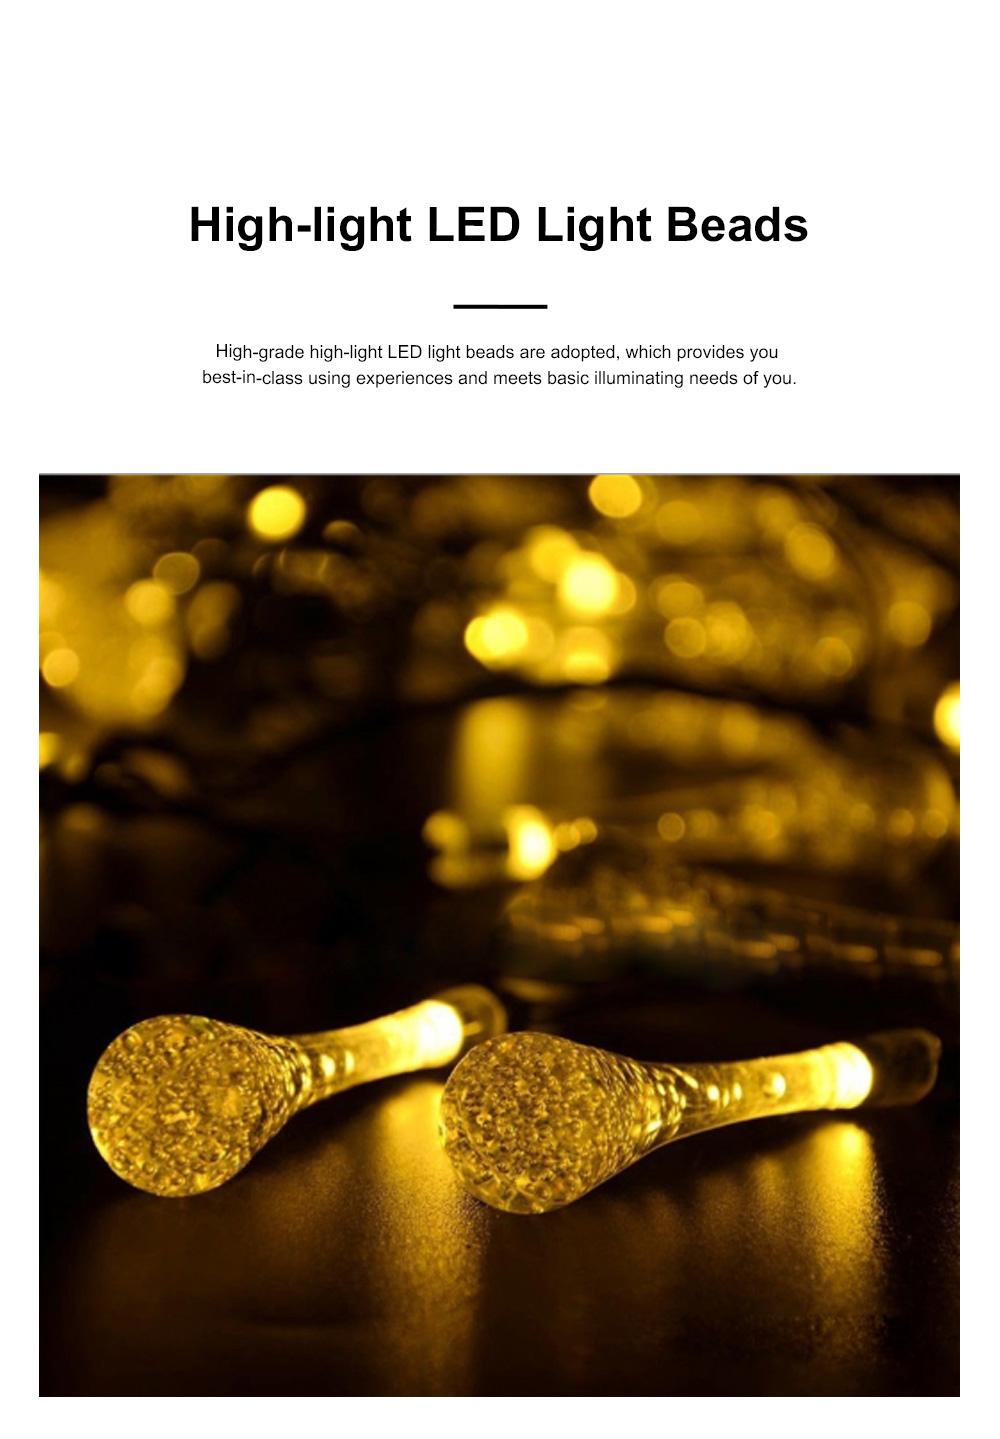 Creative 4m 20 LEDs / 5m 30 LEDs /7m 50 leds Bubble Light Solar Power Drop-Shaped LED Lights String Lamp Party Courtyard Christmas Decoration Ornaments 3